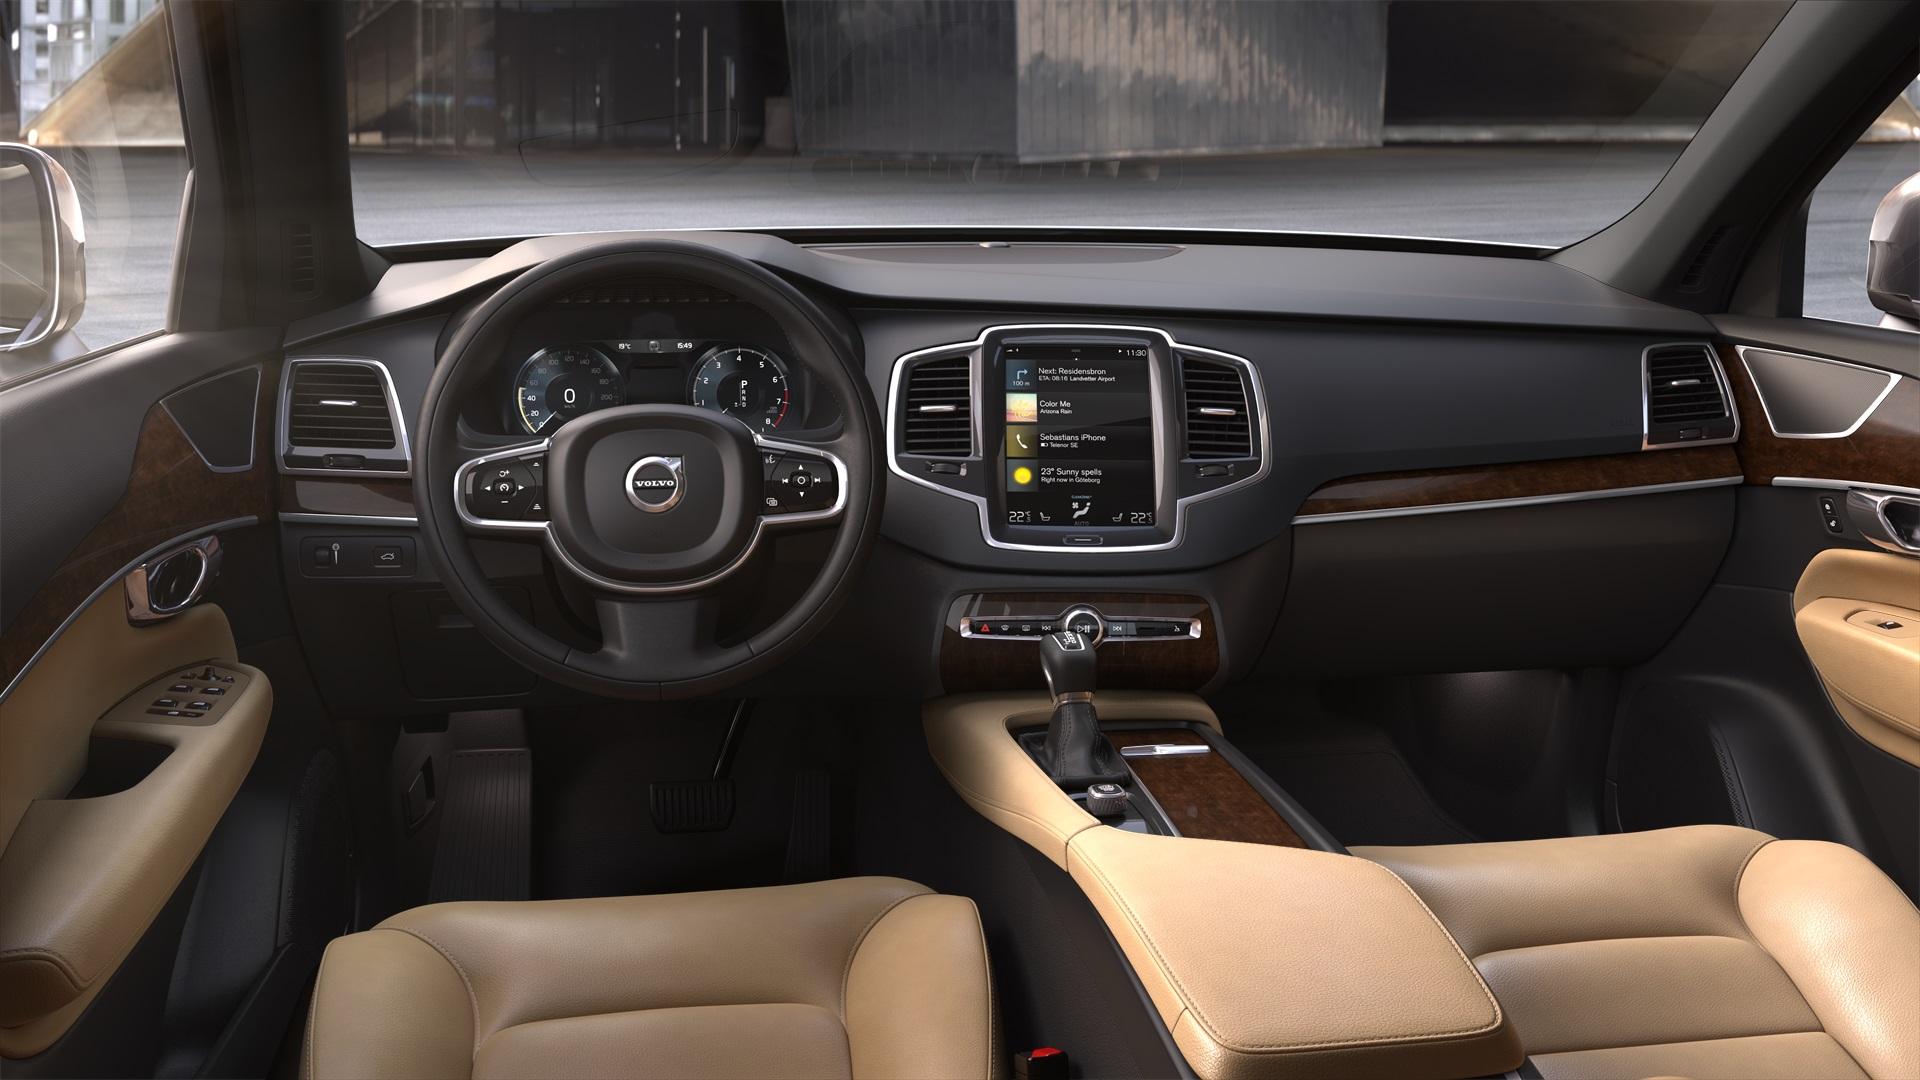 2019 volvo xc90 t6 awd momentum amber leather interior a 2019 volvo xc90 t6 awd momentum amber